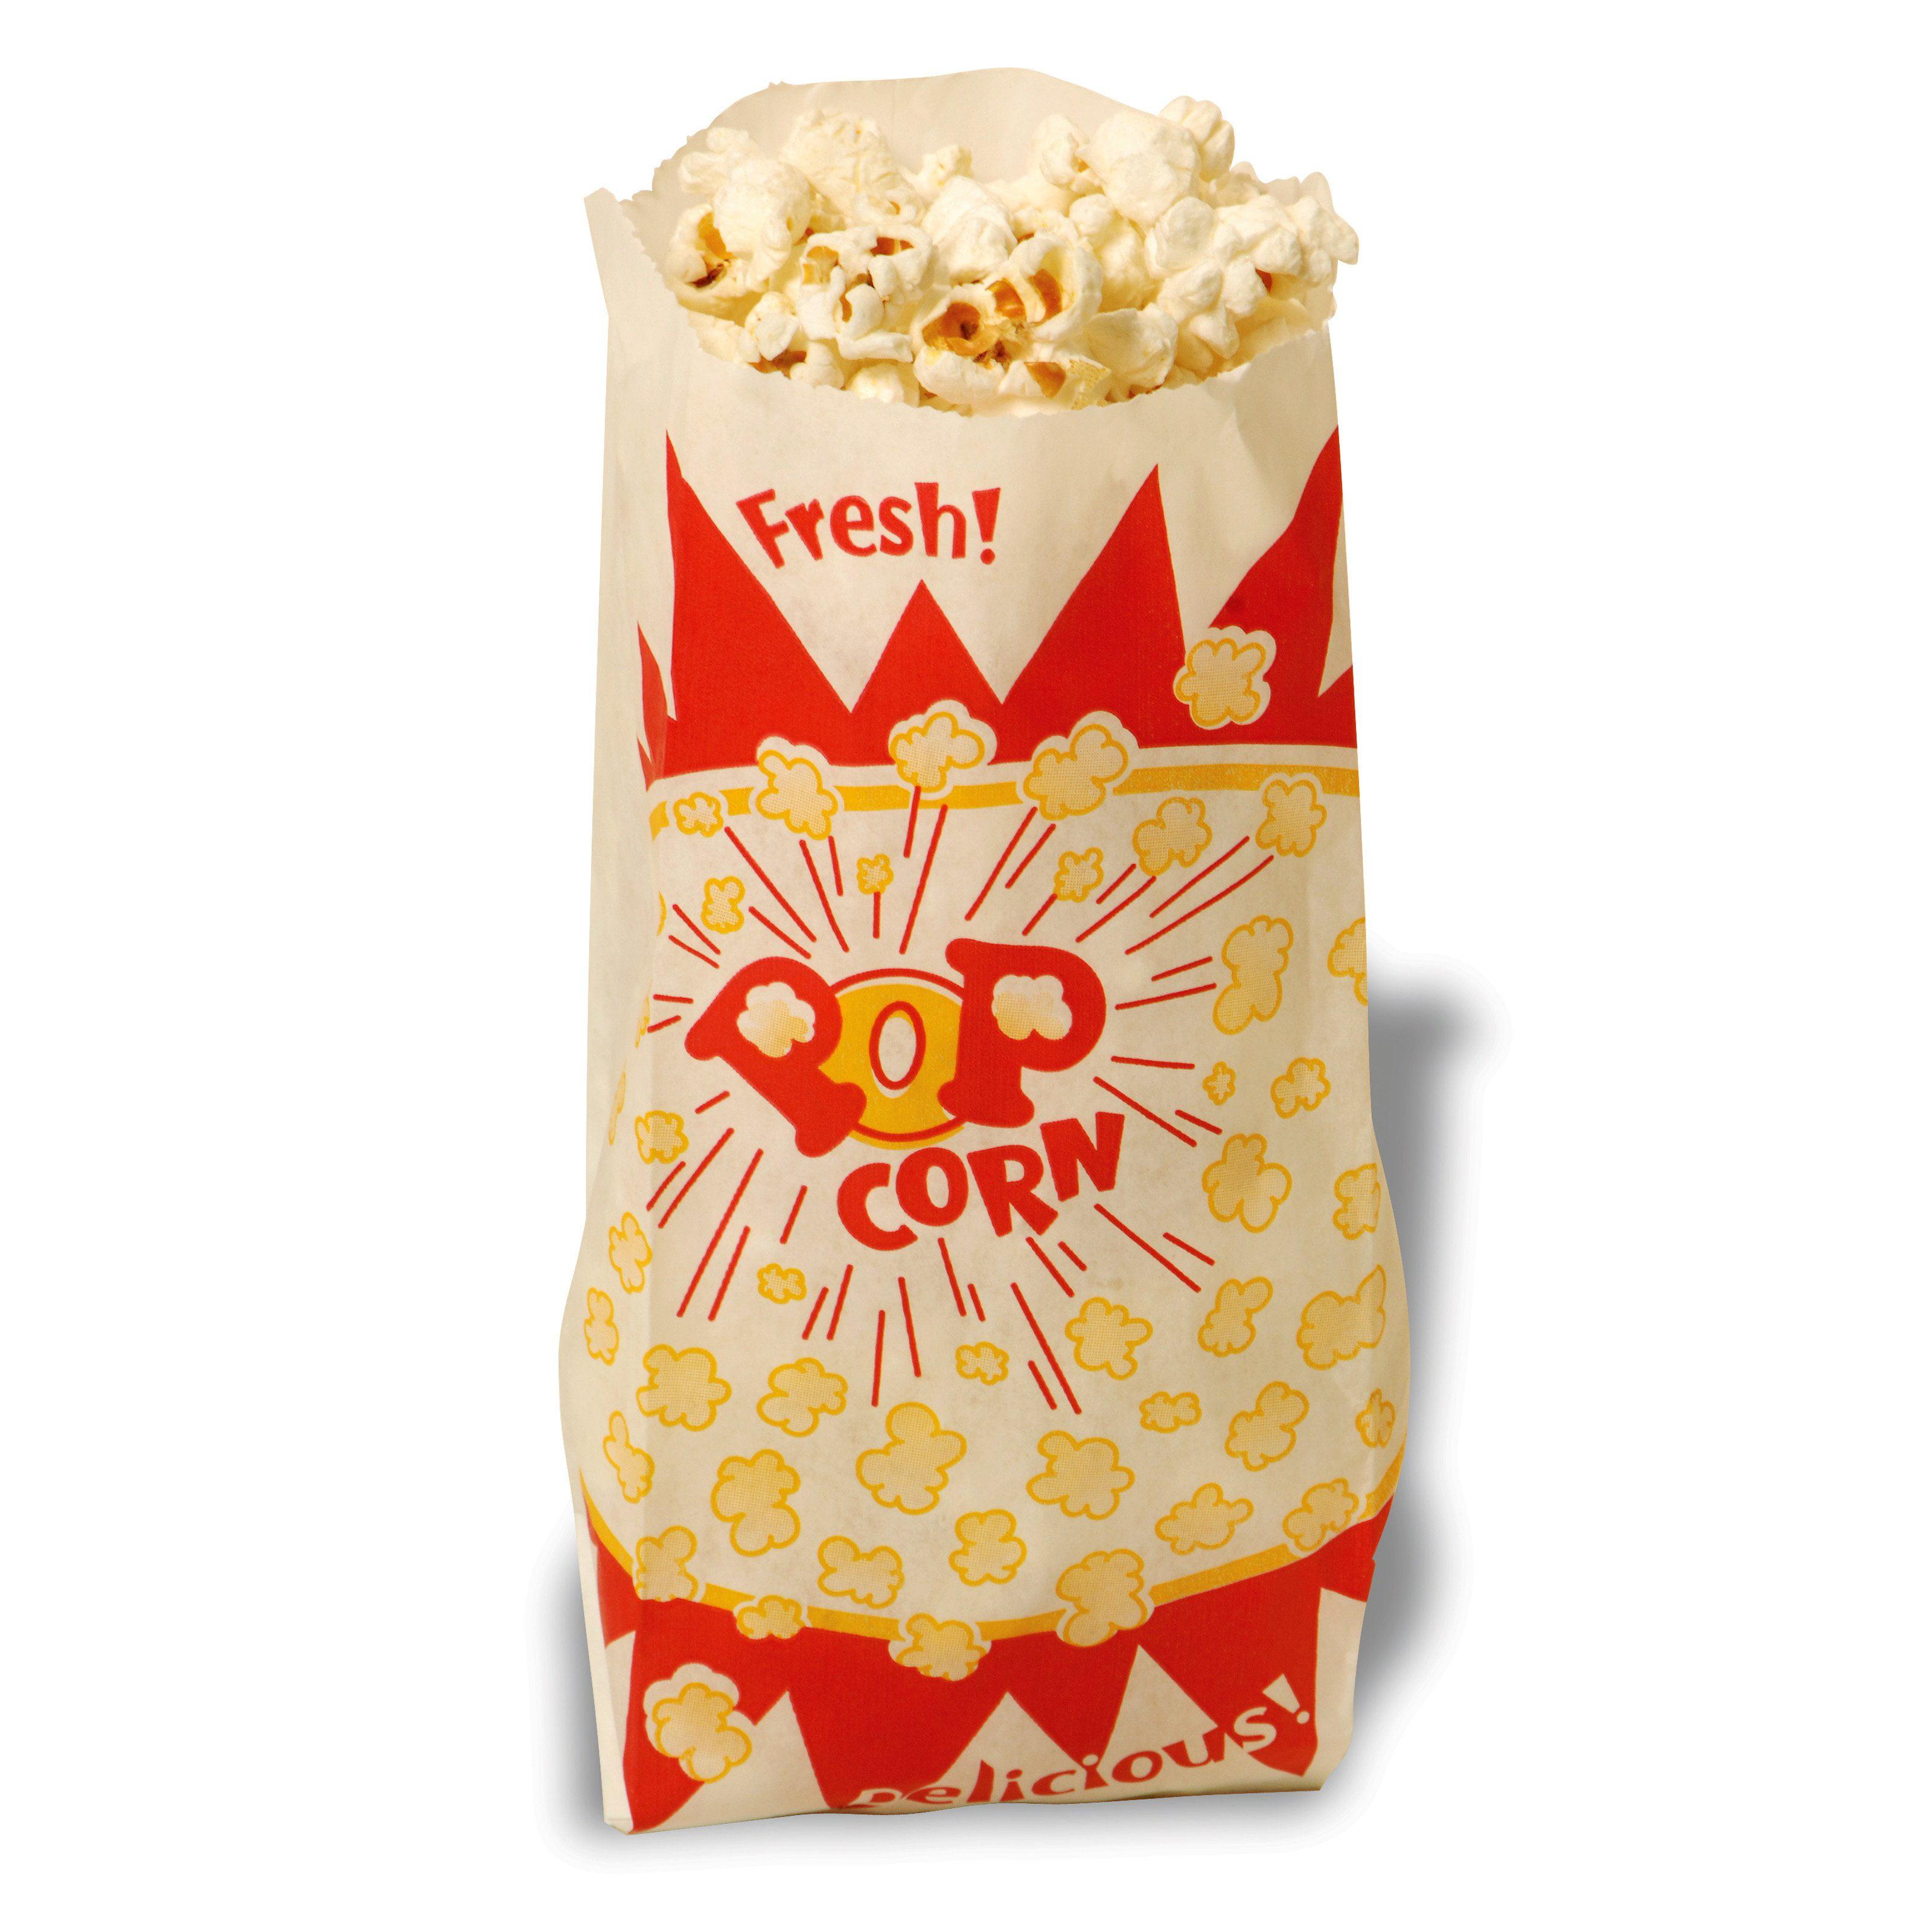 Benchmark USA Popcorn Bags by Benchmark USA